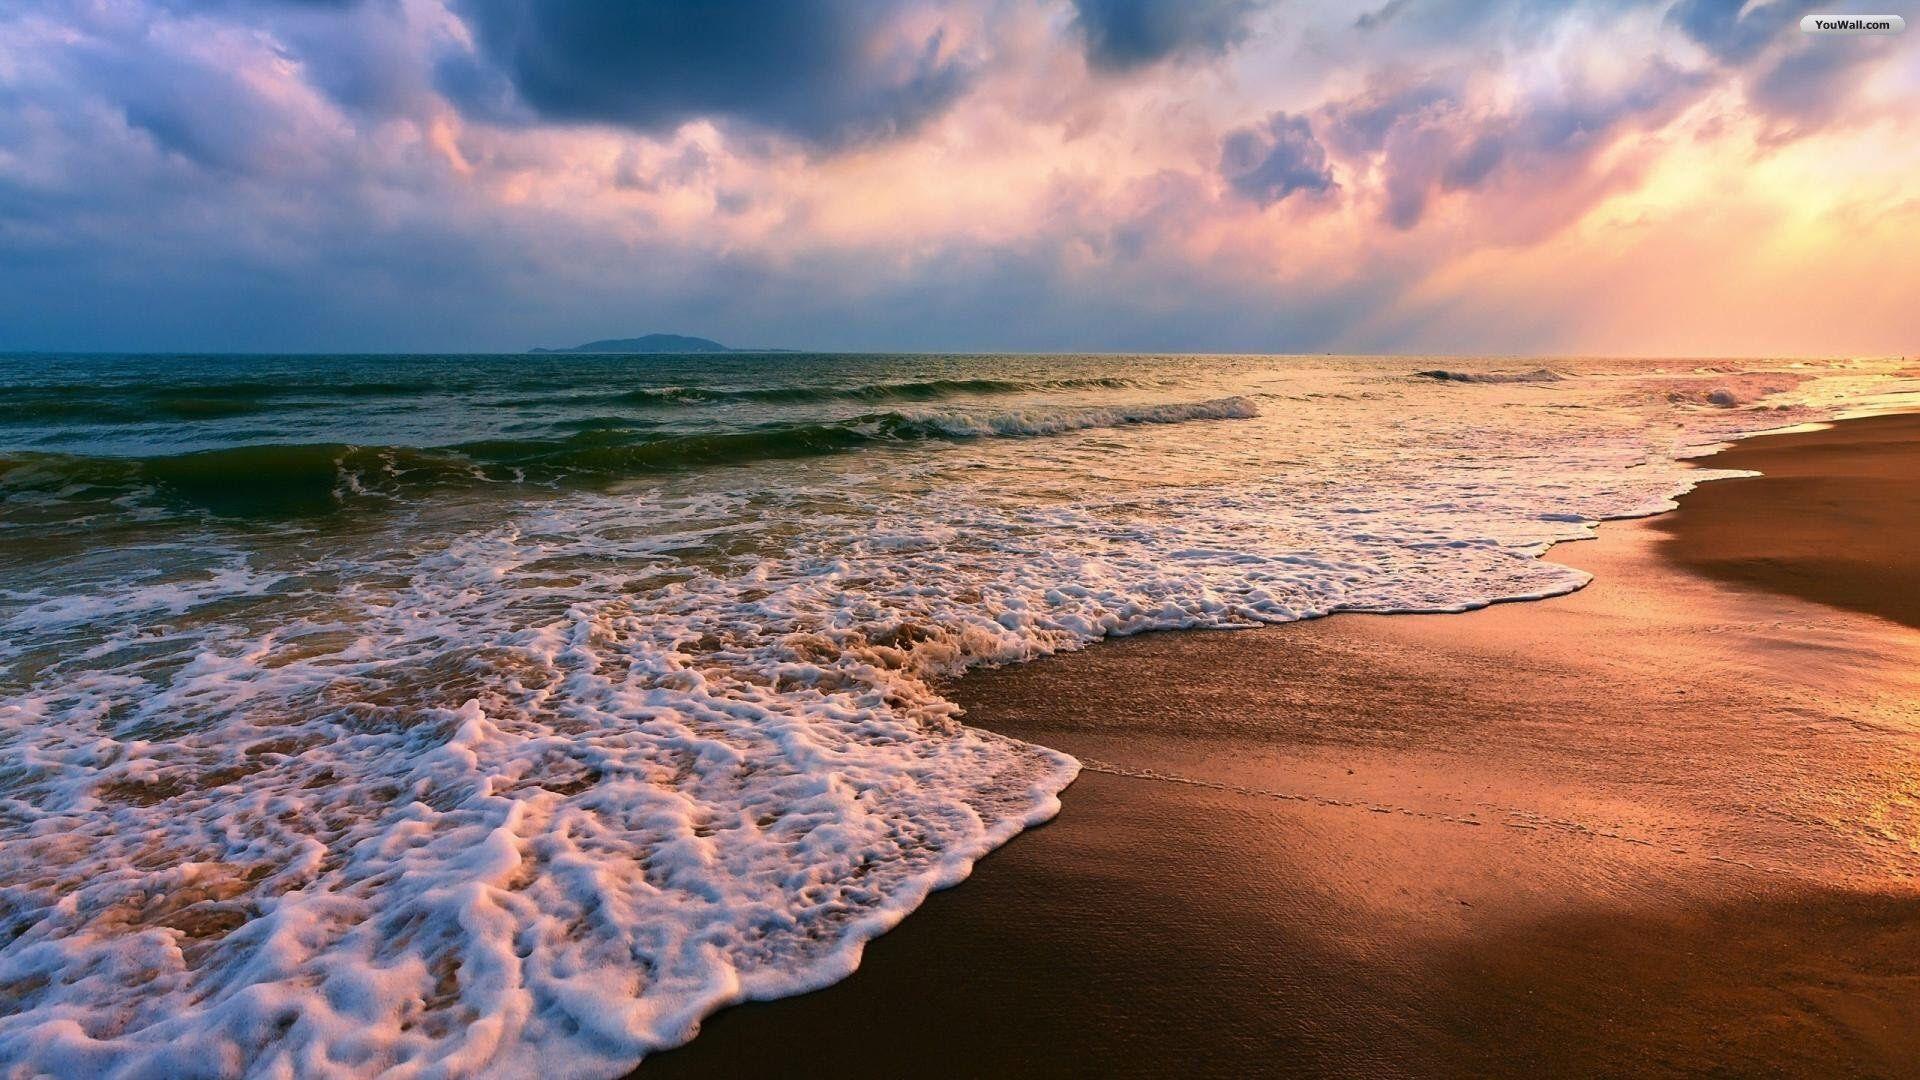 sunrise beach sand wallpaper - photo #15